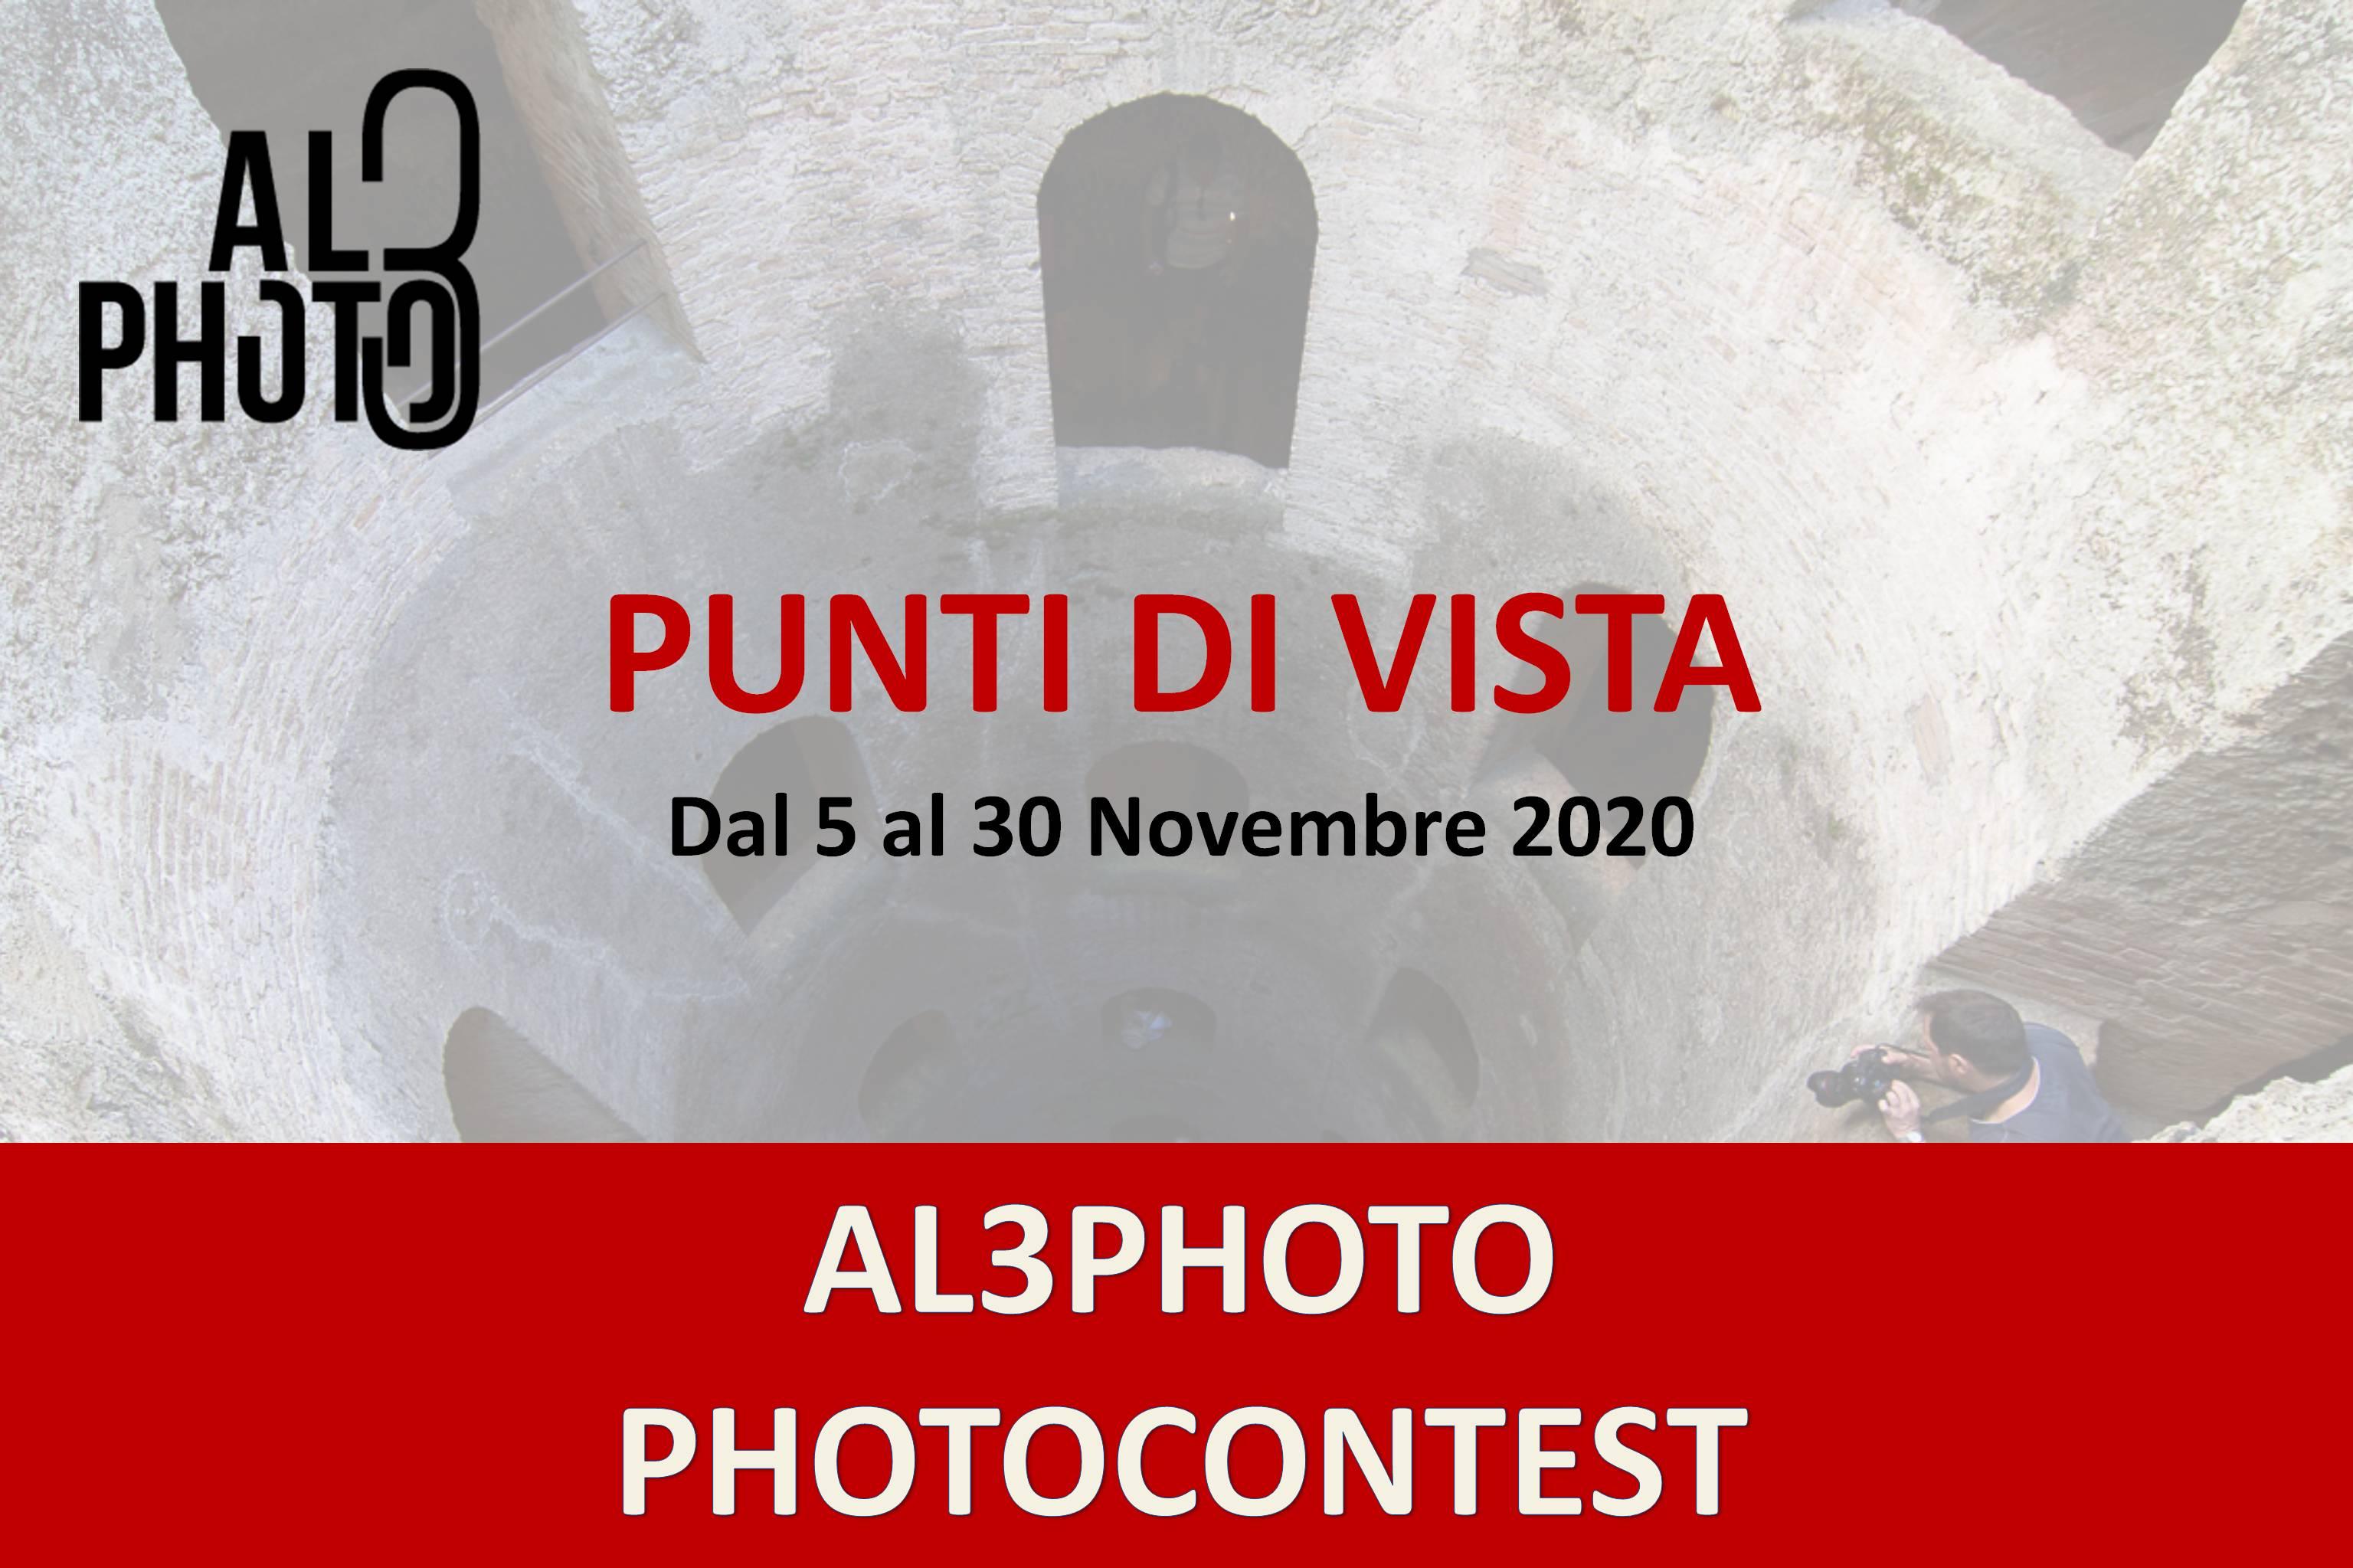 Punti di Vista Fotocontest